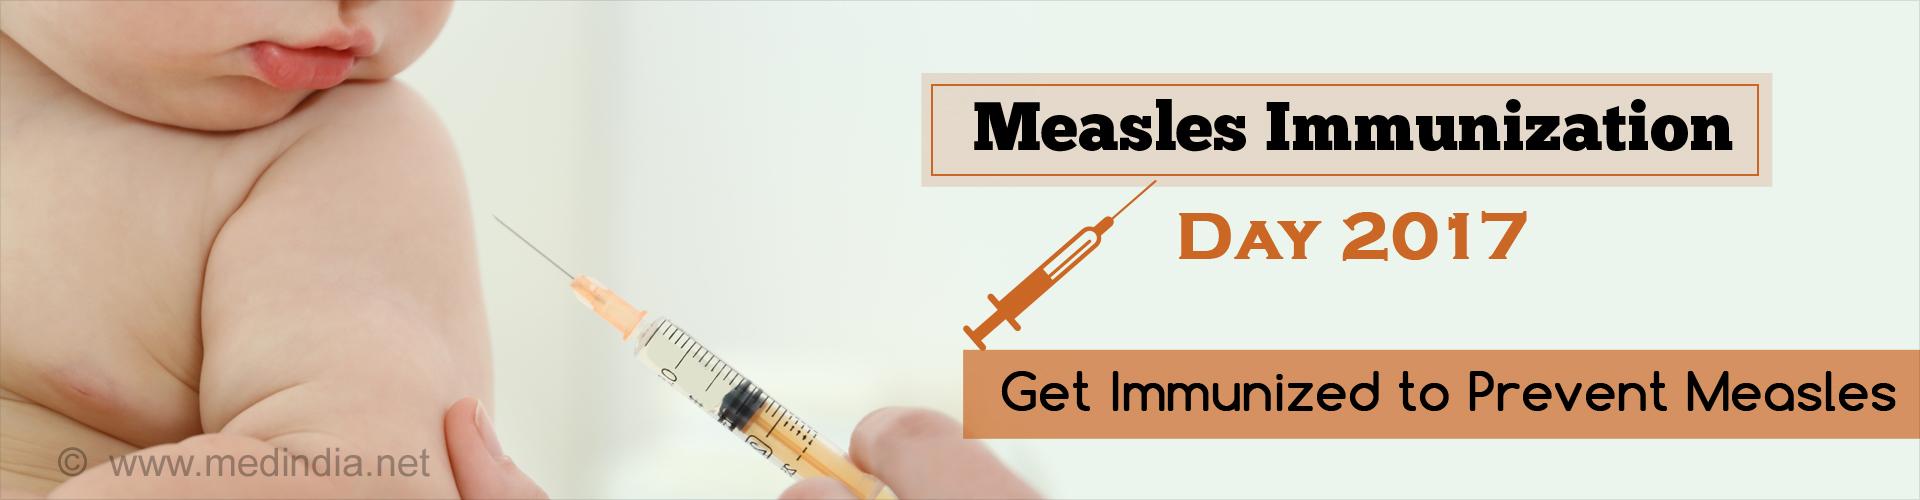 Measles Immunization Day 2017: Get Immunized